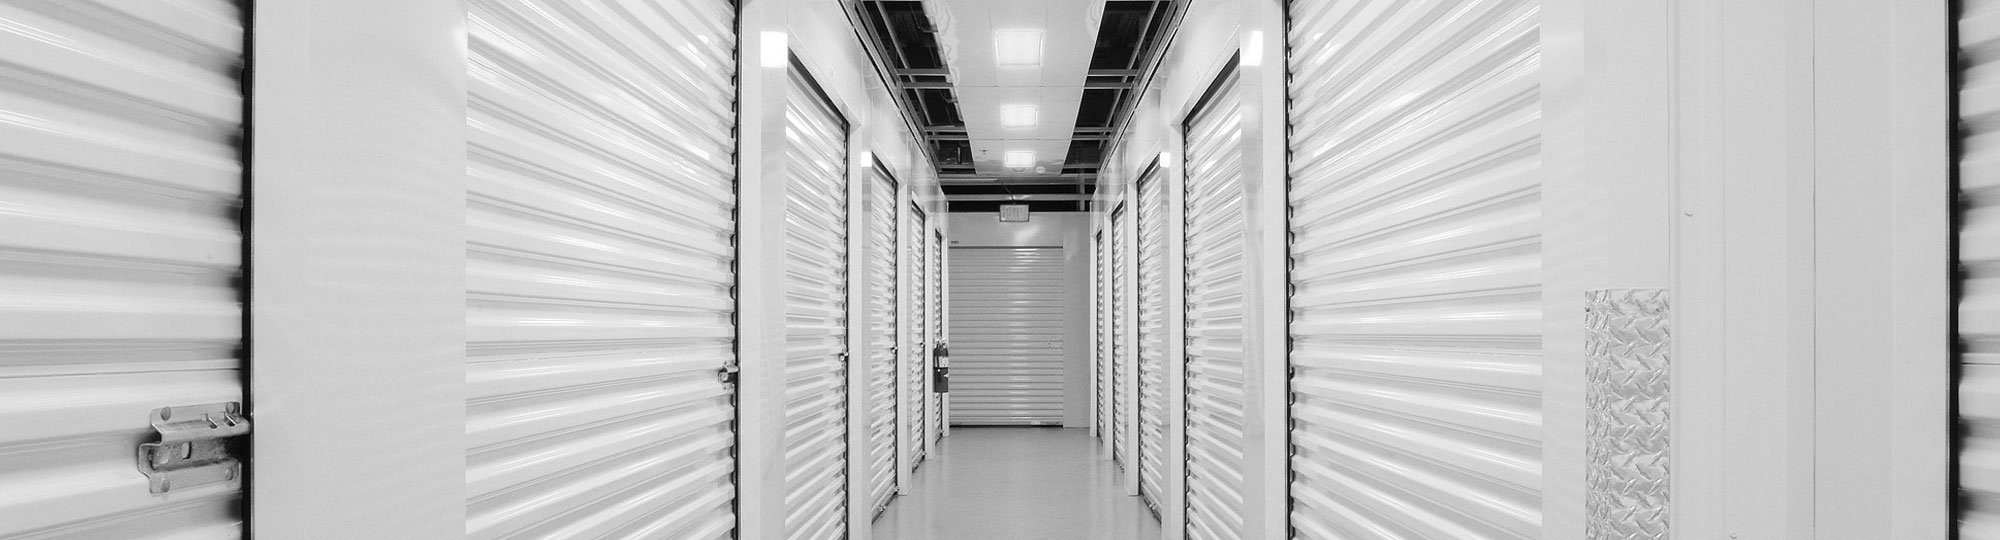 hallway_interior_rollup